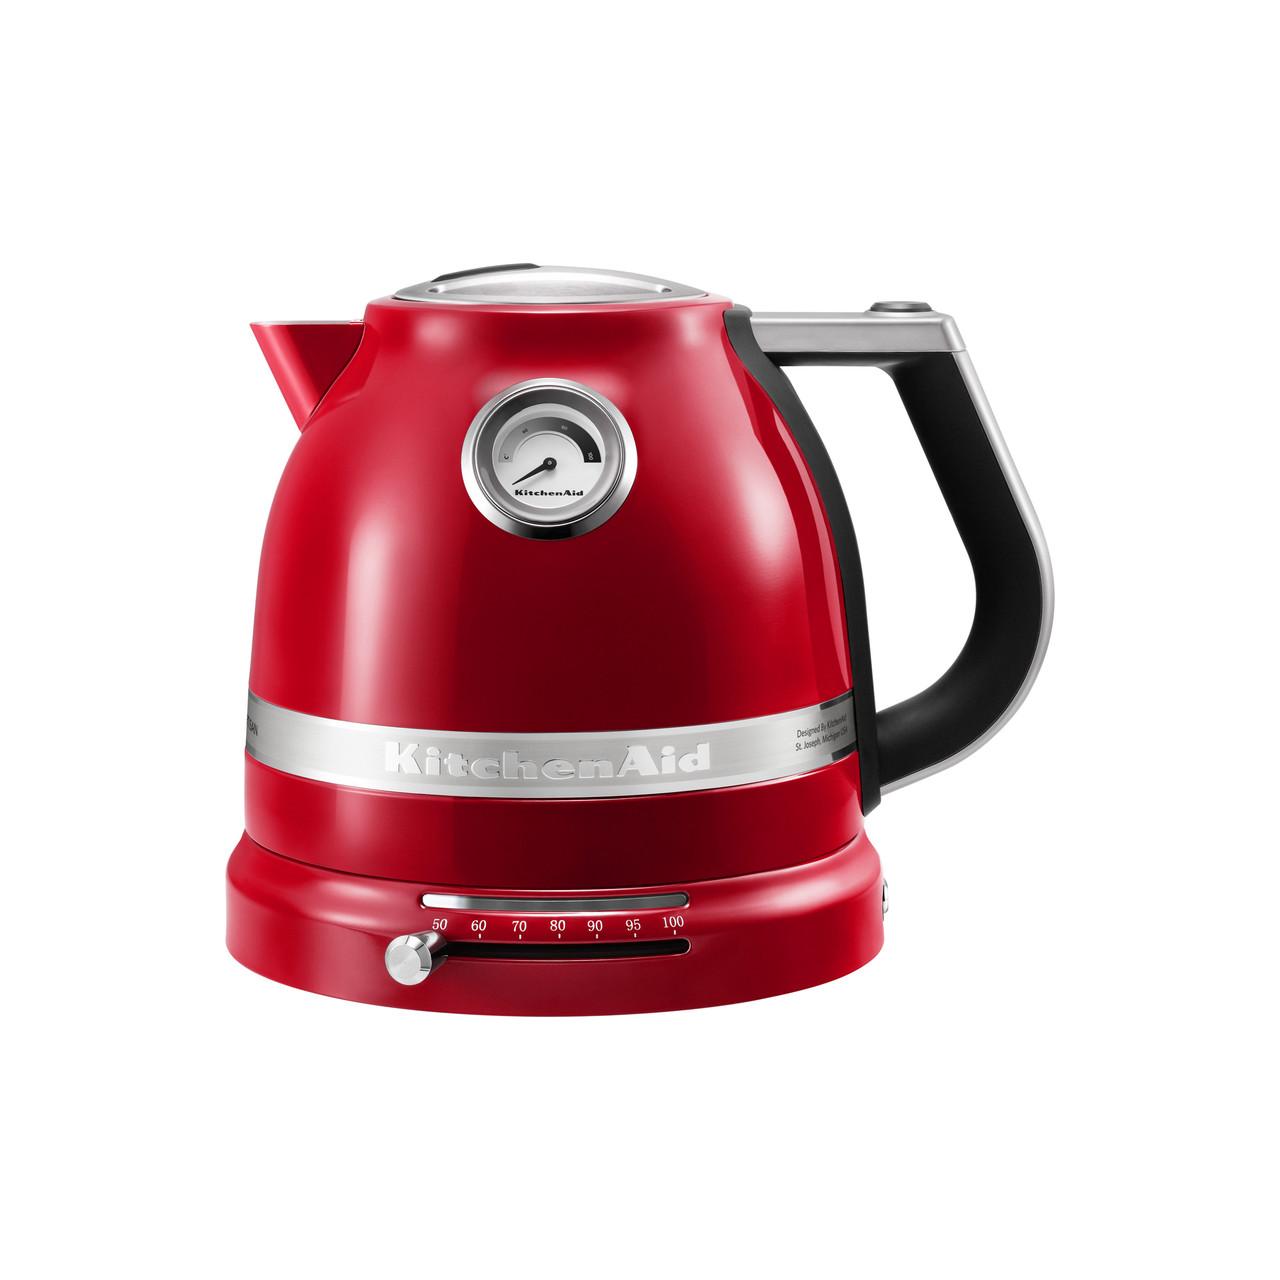 Чайник электрический с фильтром 1.5 л KitchenAid ARTISAN 1.5 L Kettle 5KEK1522EER